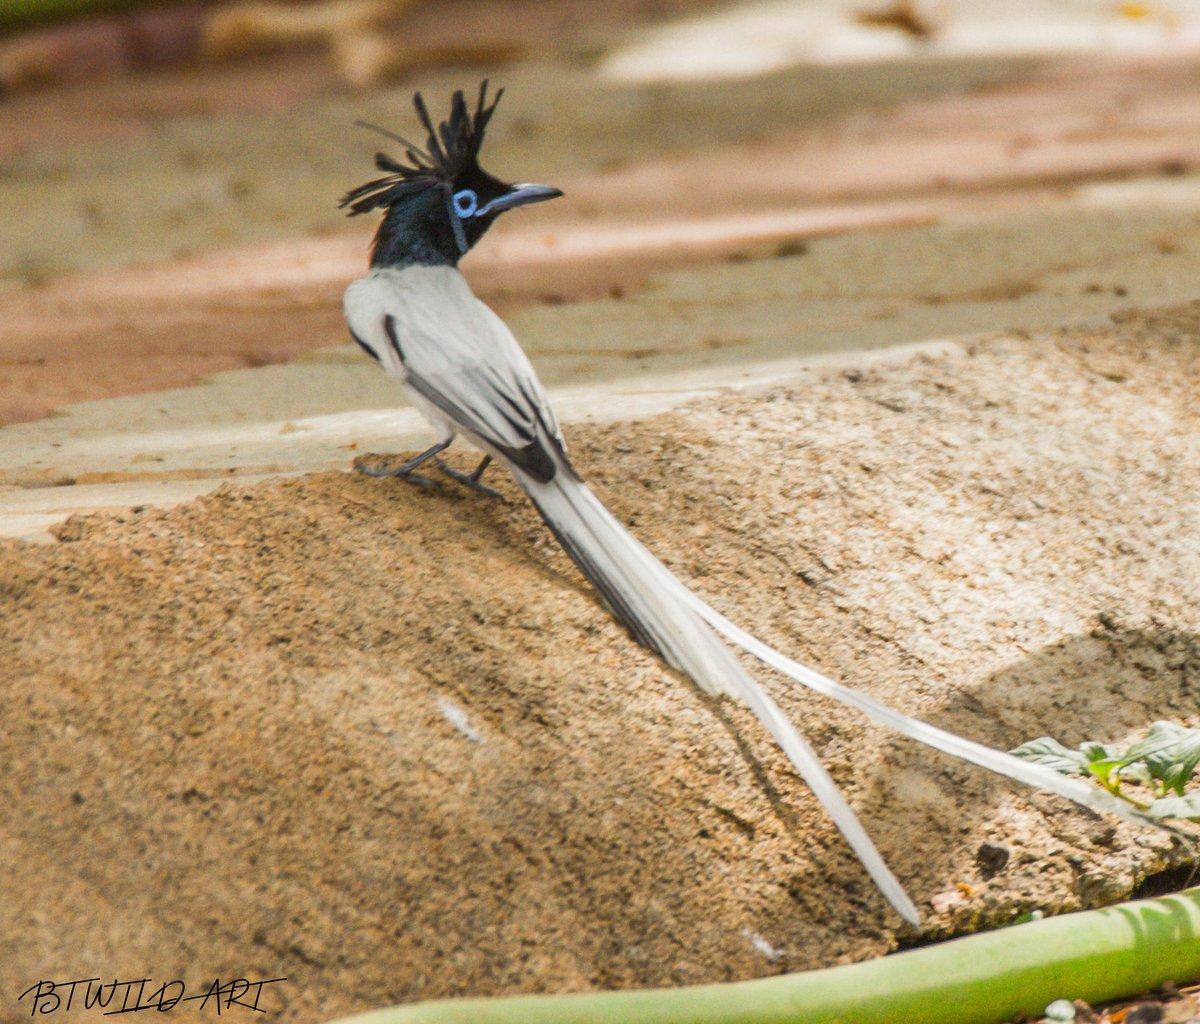 IndianParadise flycatchers r either predominantly bright rufous above or predominantly white  #birdphotography #photoshoot #photographer #photograghy #TravelBlogTips #blogger #tourists #wildlife #beautiful #canon @Canon_India @incredibleindia #naturelover